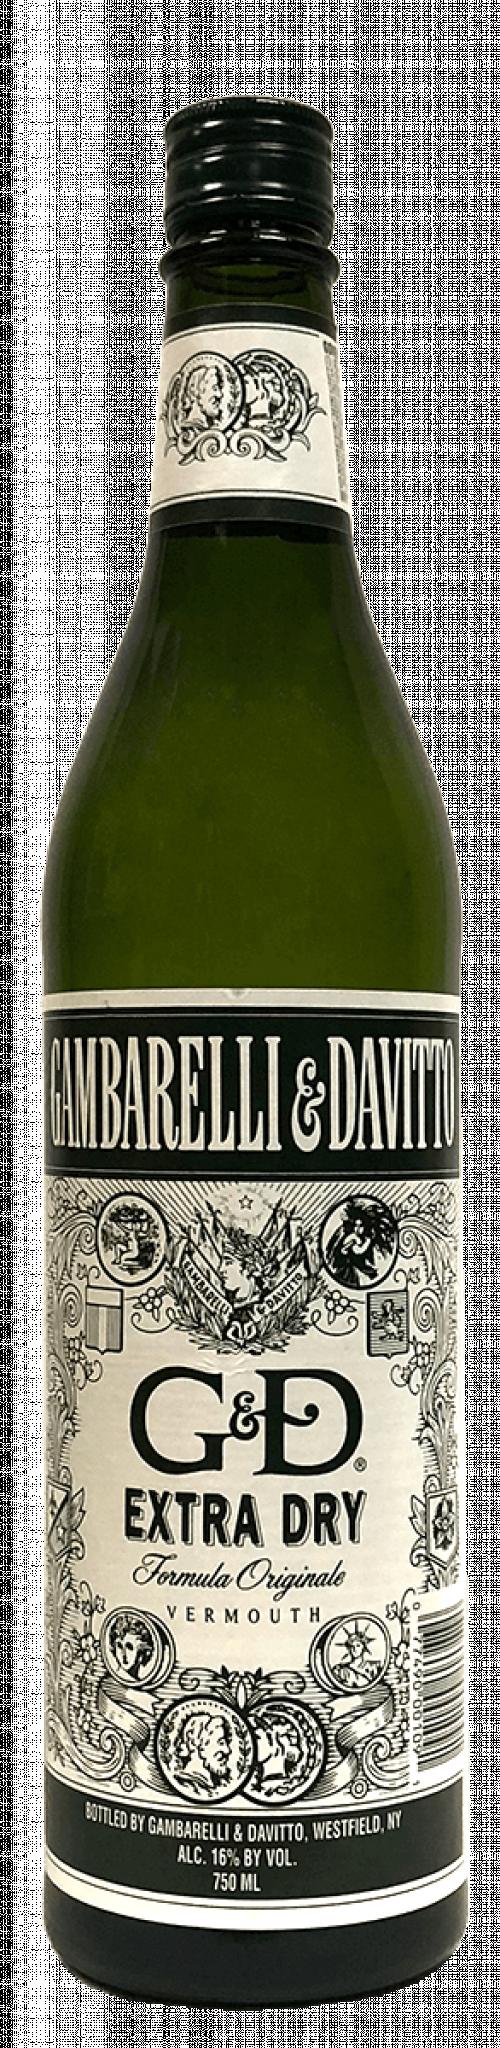 G & D Dry Vermouth 750ml